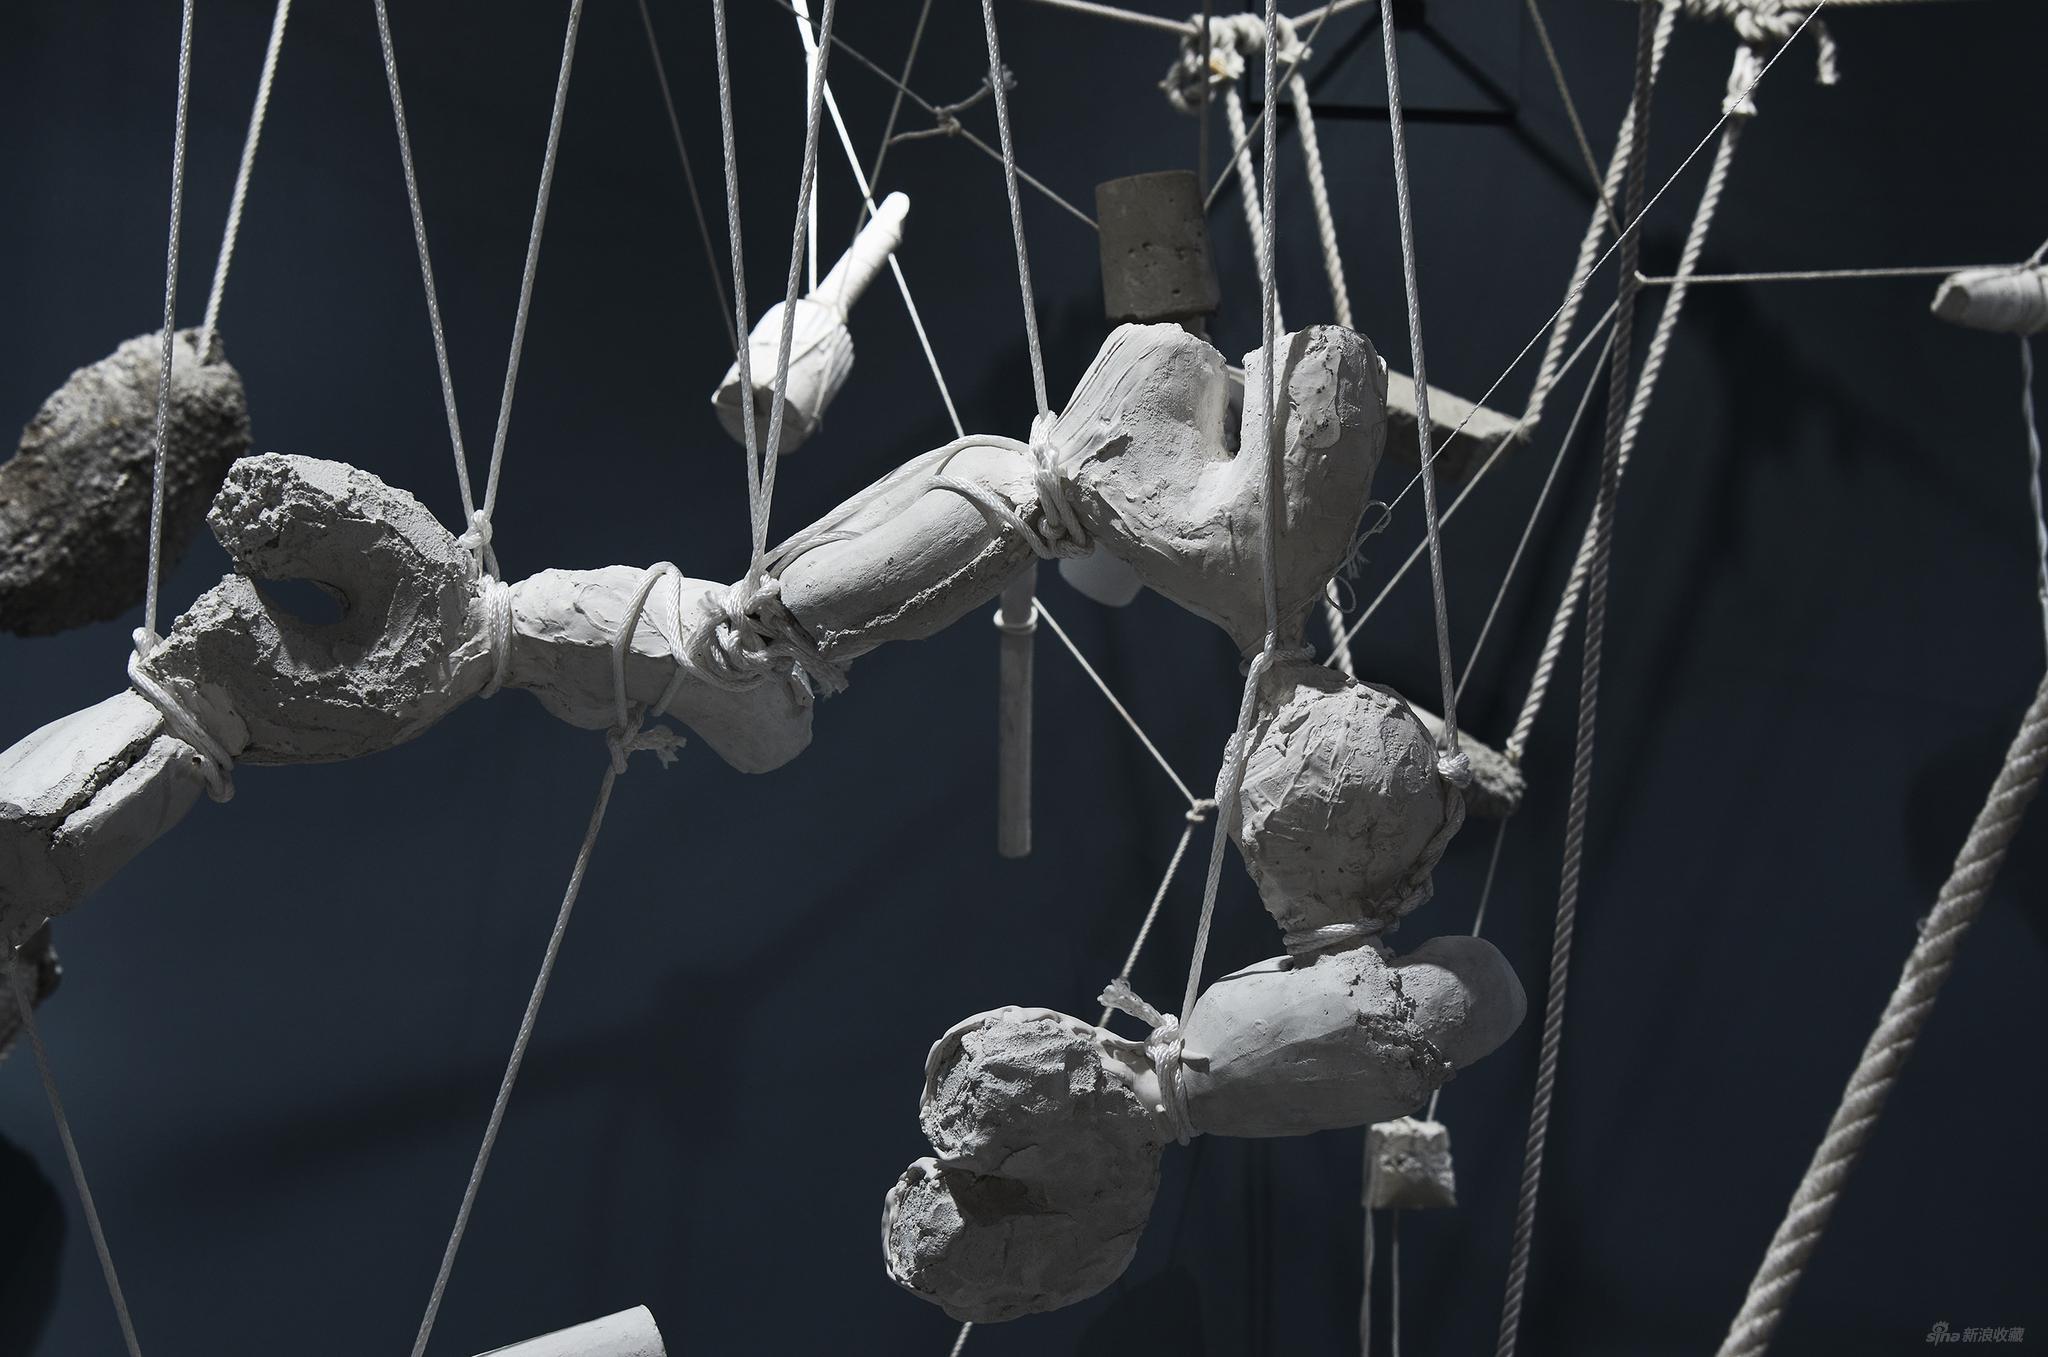 Carriage Constellation(細節圖) 2010 石膏, 繩索